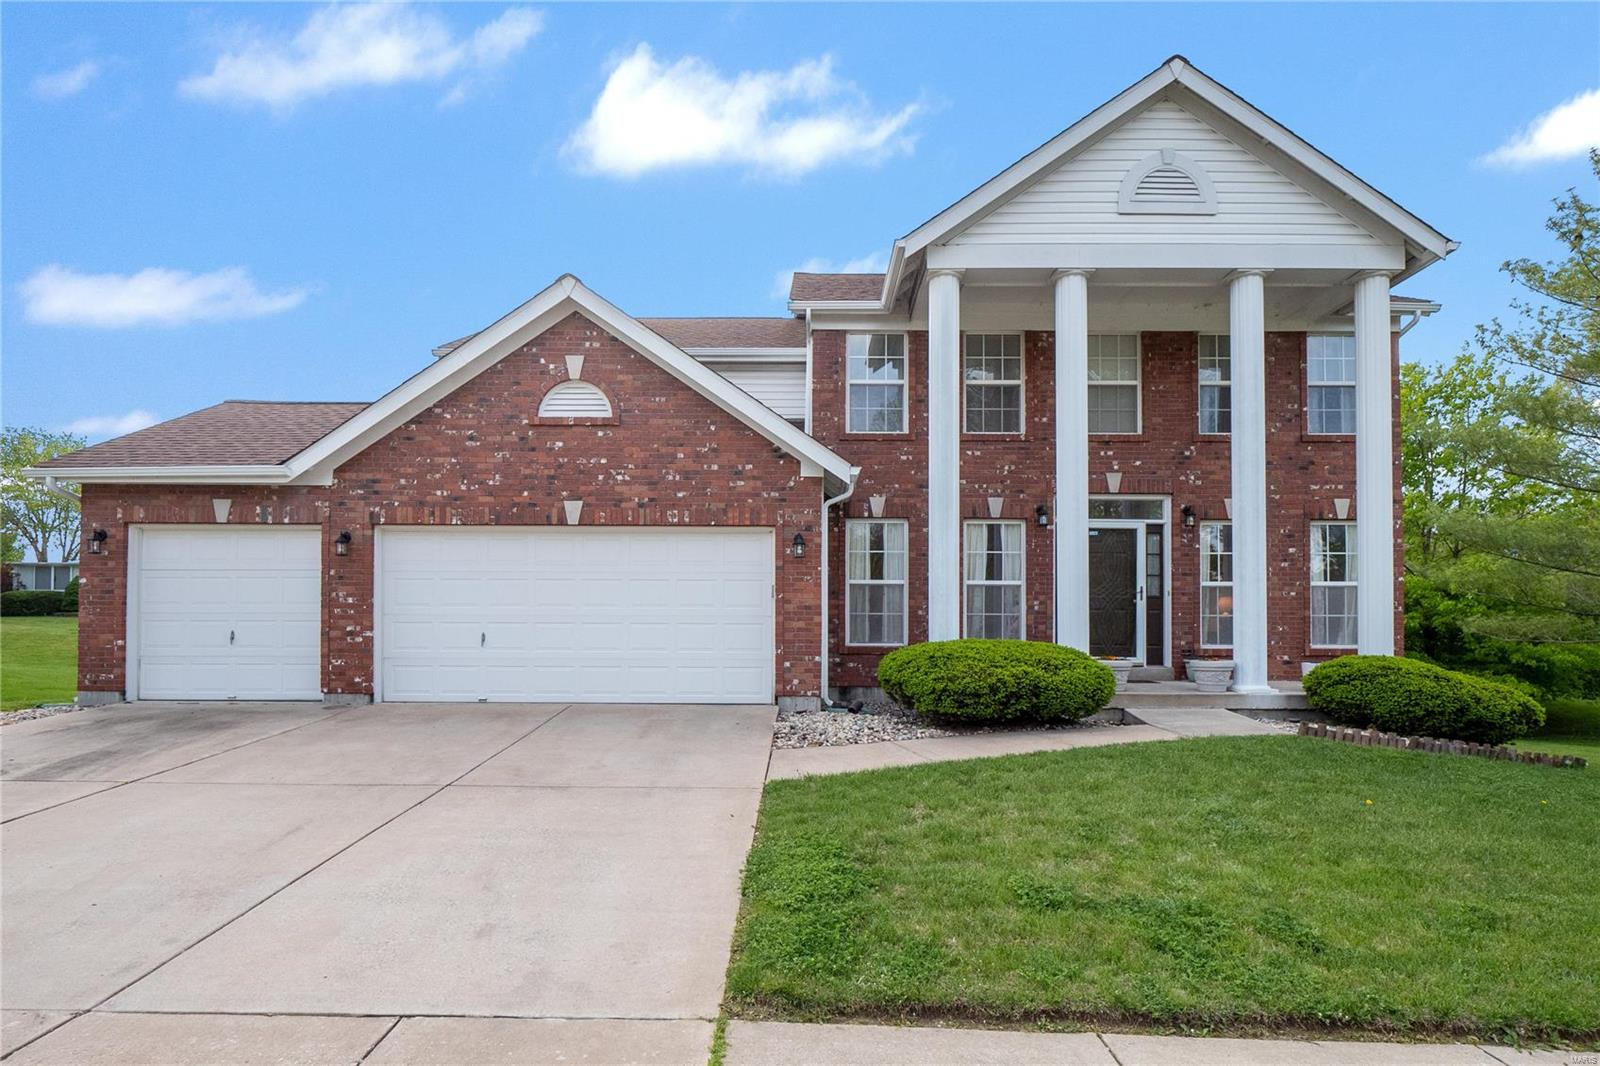 15568 Debridge Way Property Photo - Florissant, MO real estate listing